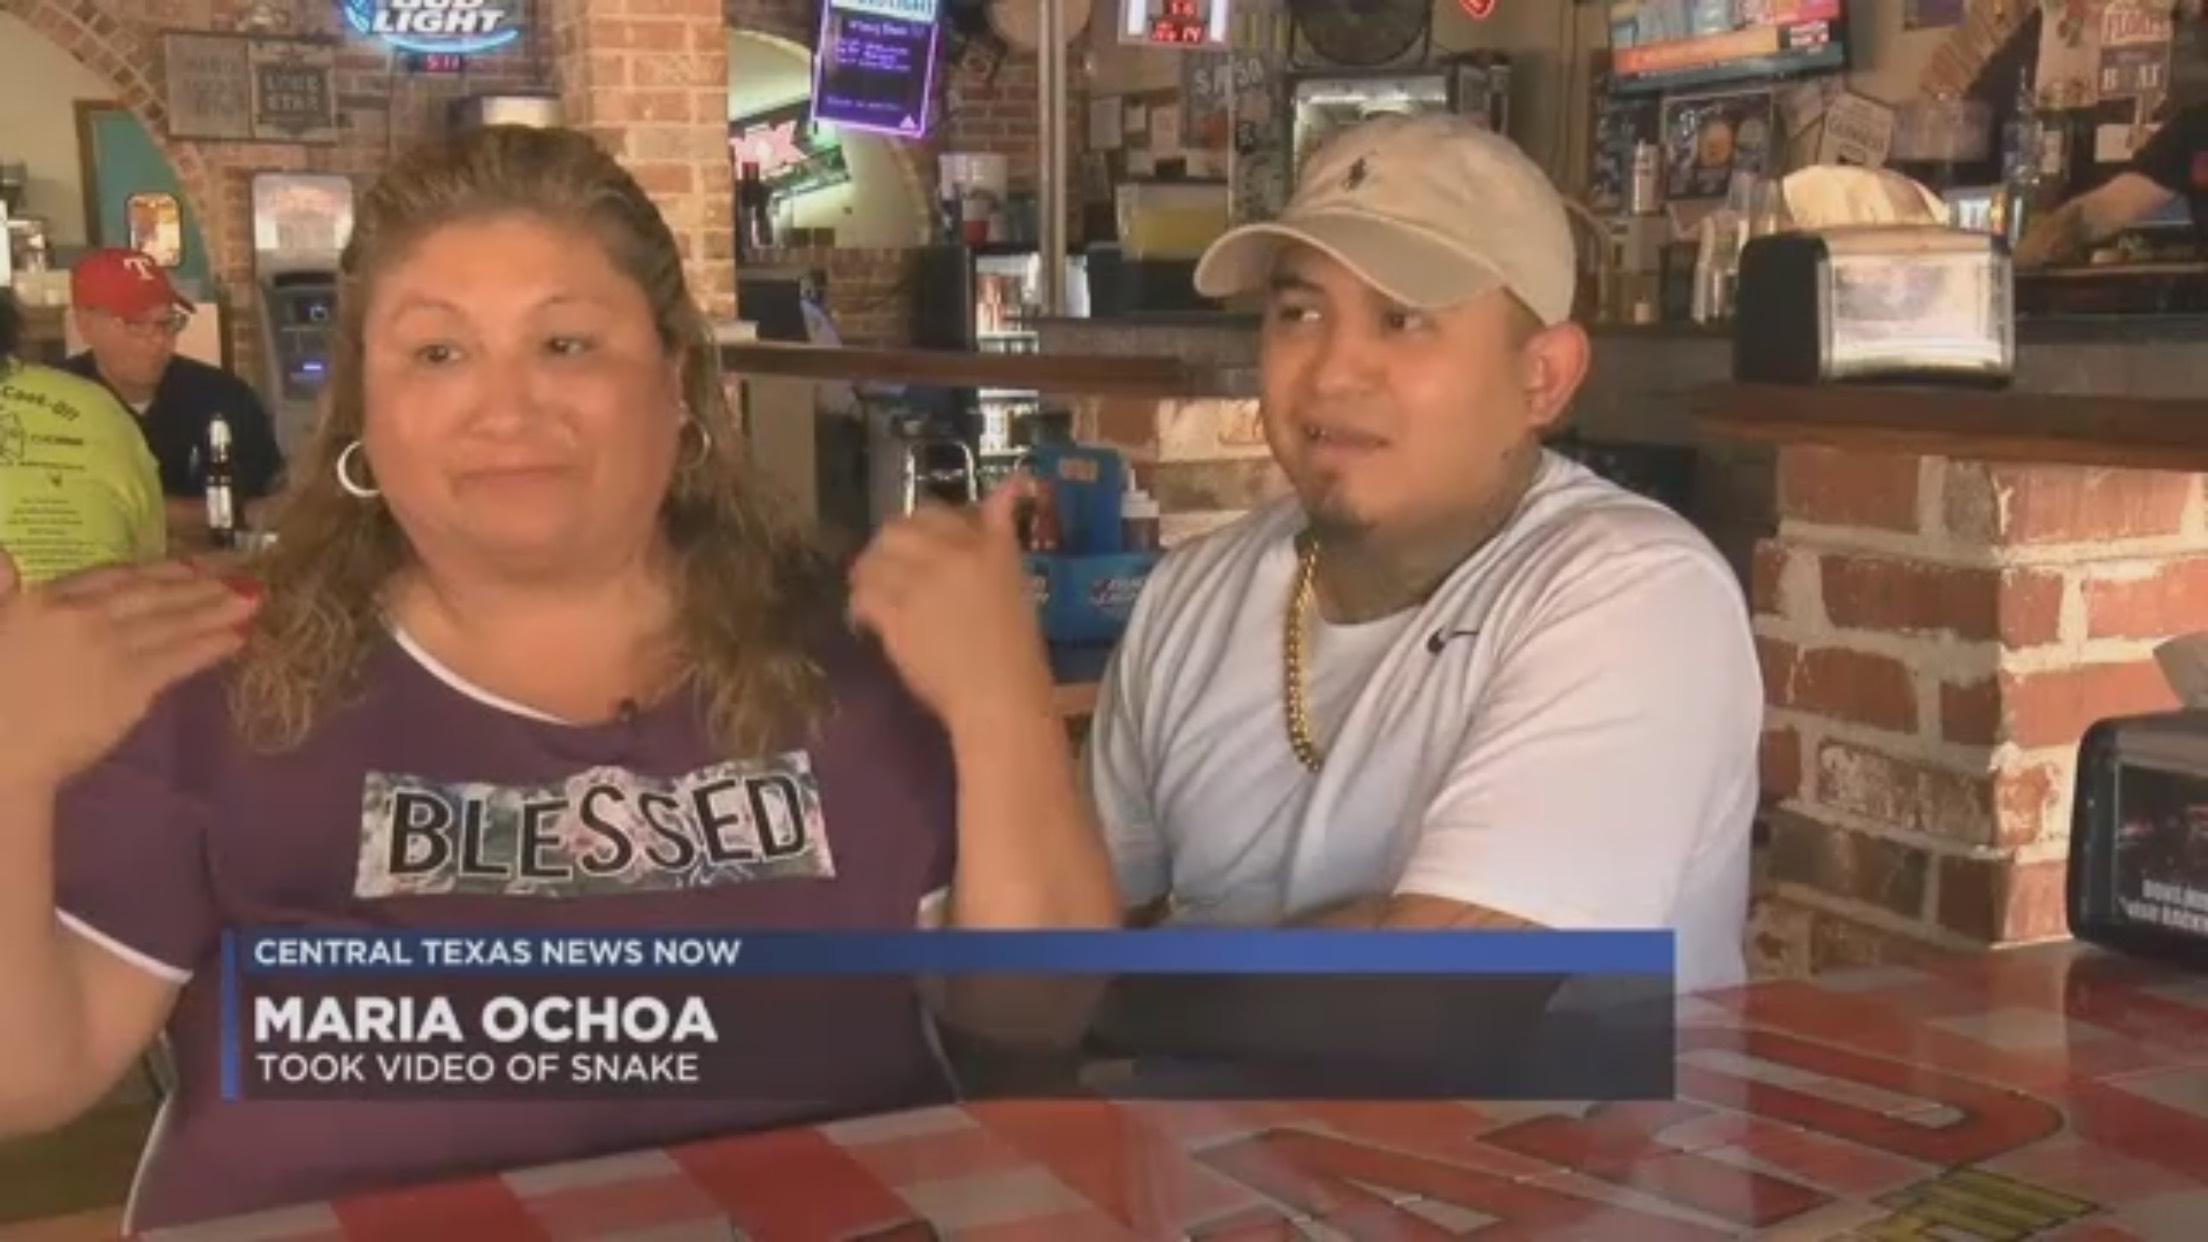 Maria Ochoa: Took Video Of Snake